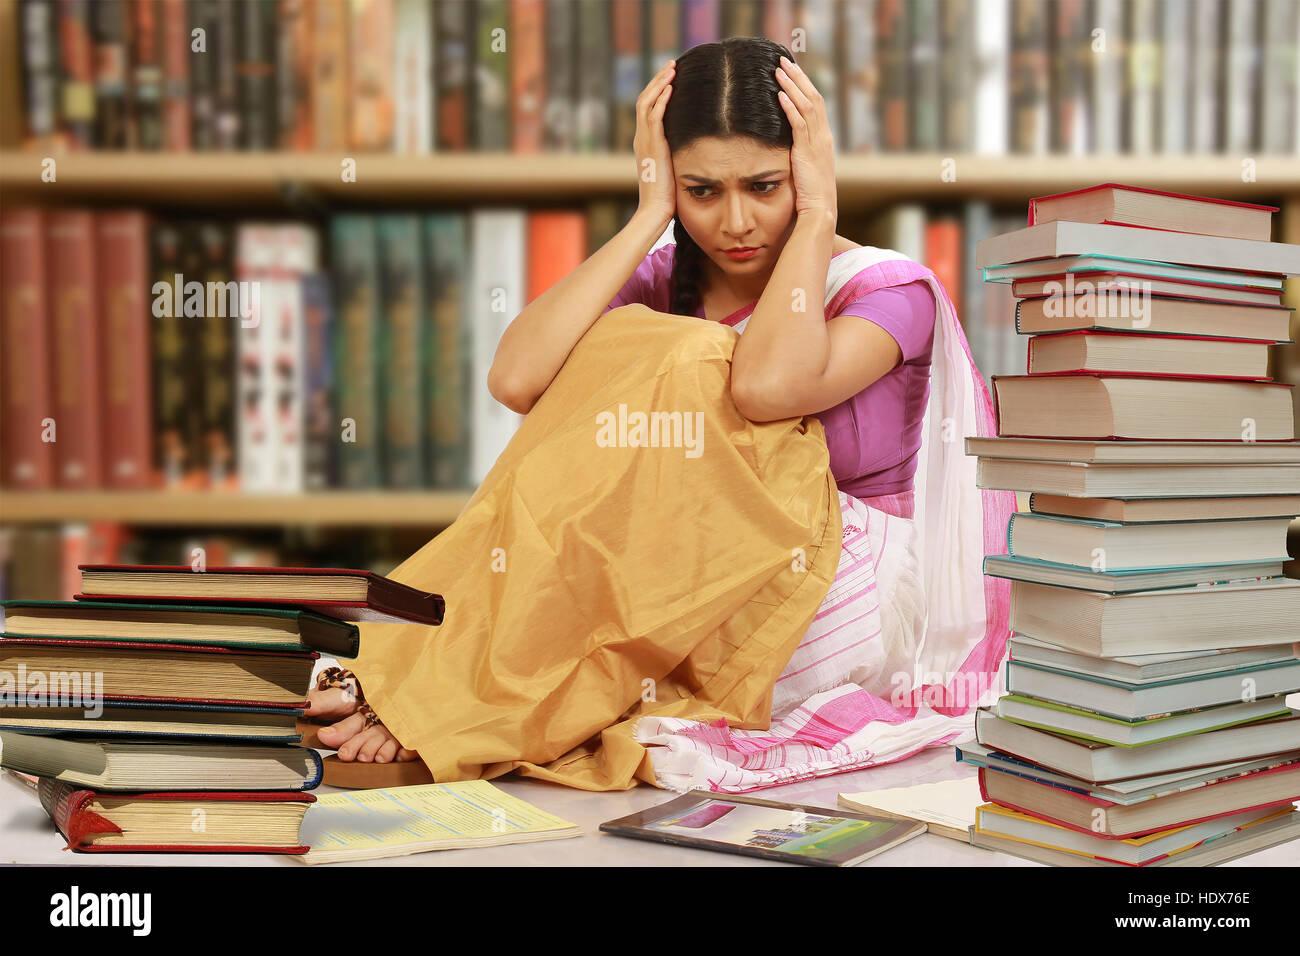 Books Pressure of a College Student - Stock Image